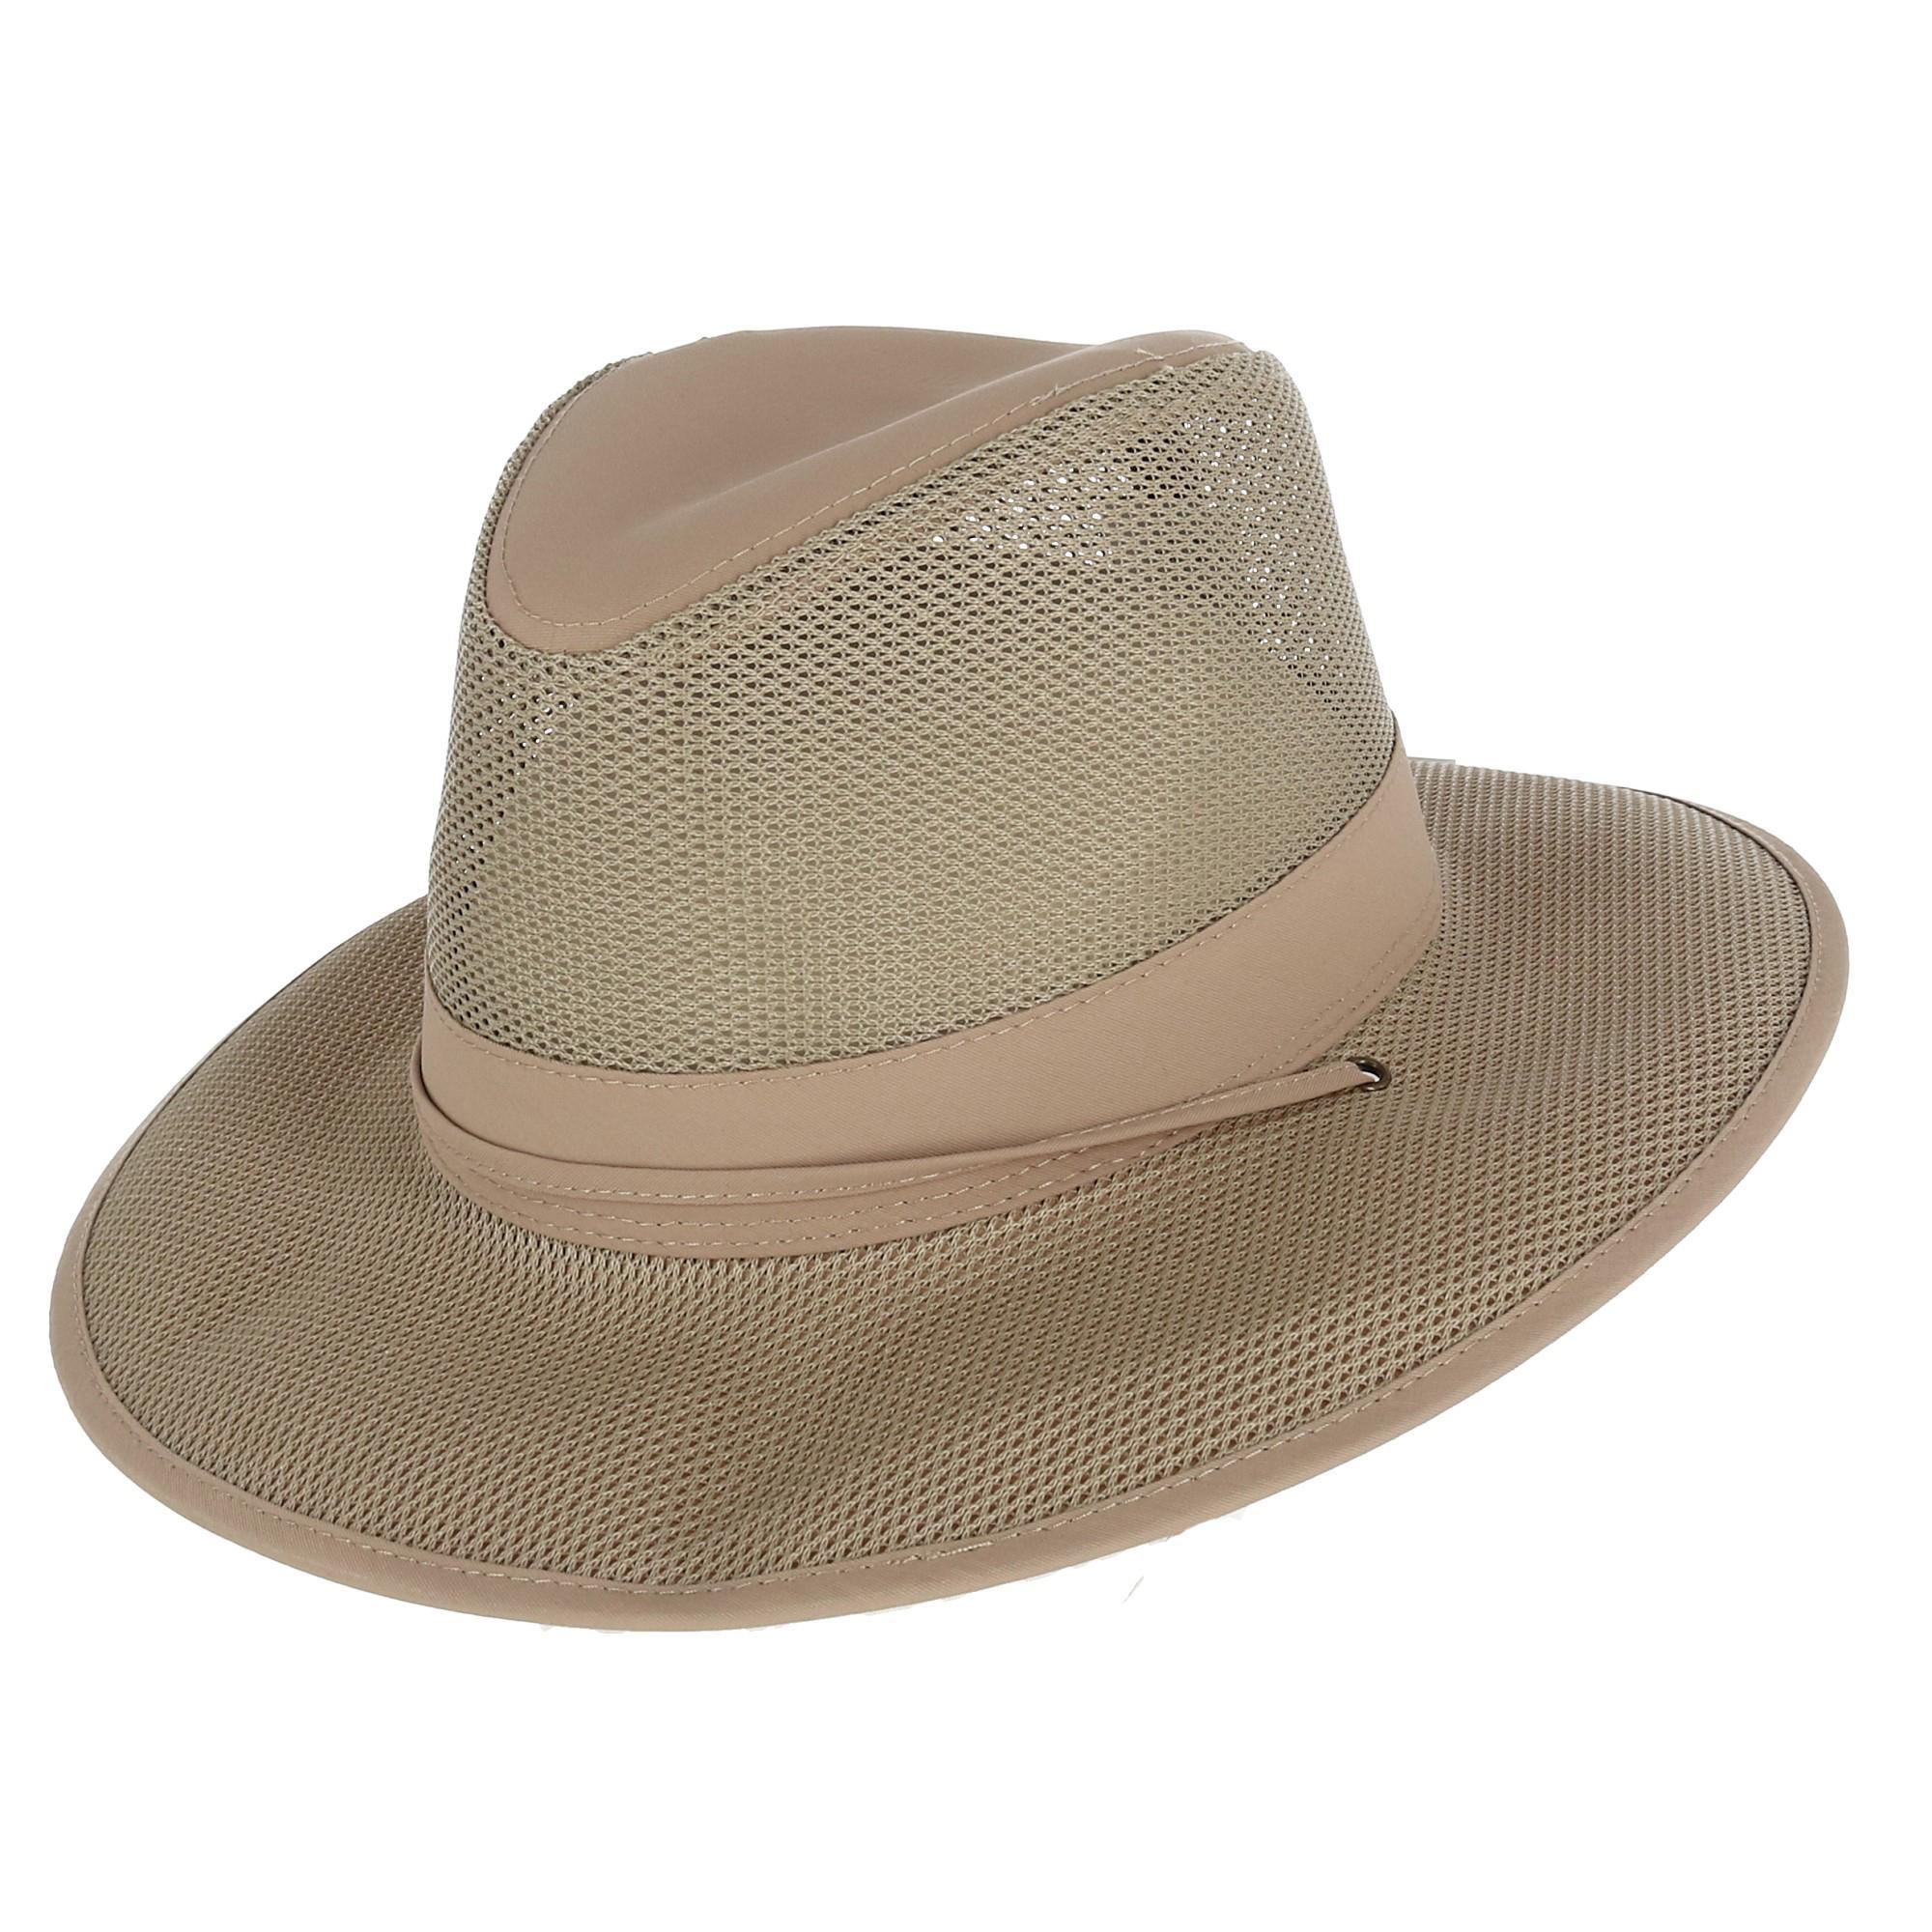 c592c5577a4f3f New Kenny K Men's Lightweight Mesh Safari Hat with Chin Cord   eBay